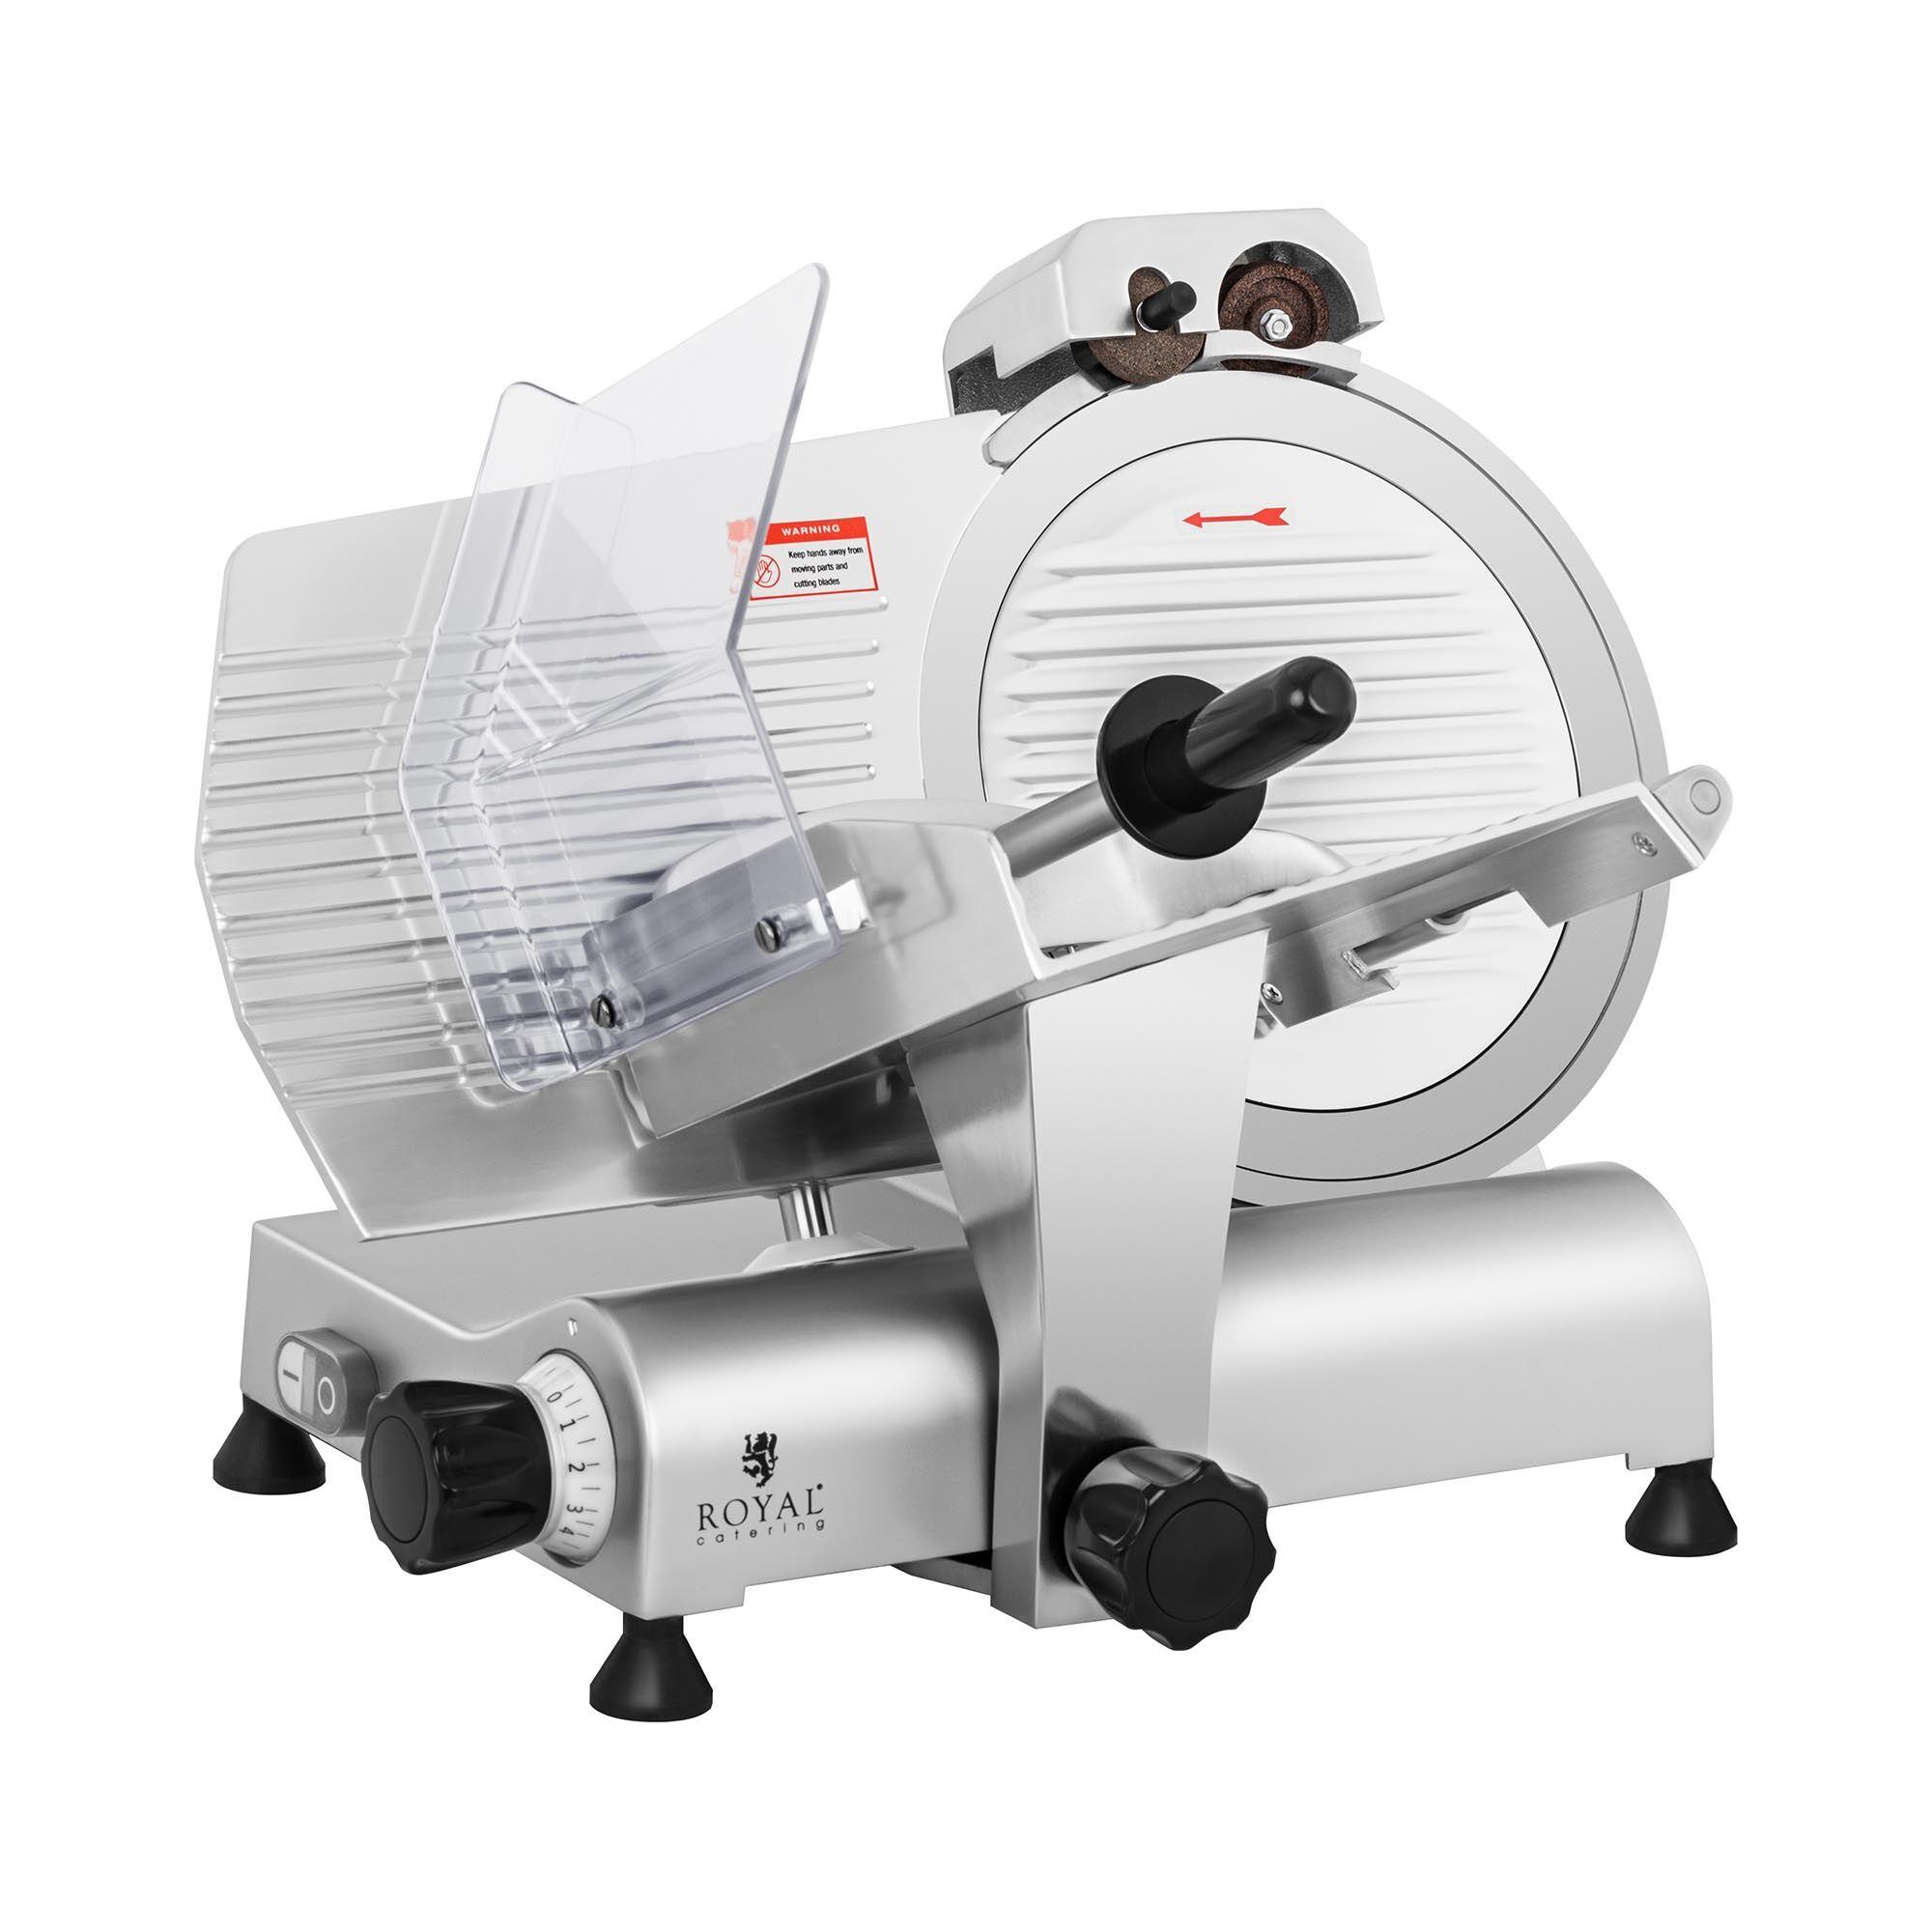 royal catering affettatrice professionale elettrica - Ø 300 mm - 0-11 mm - con affilacoltelli rcam-300e